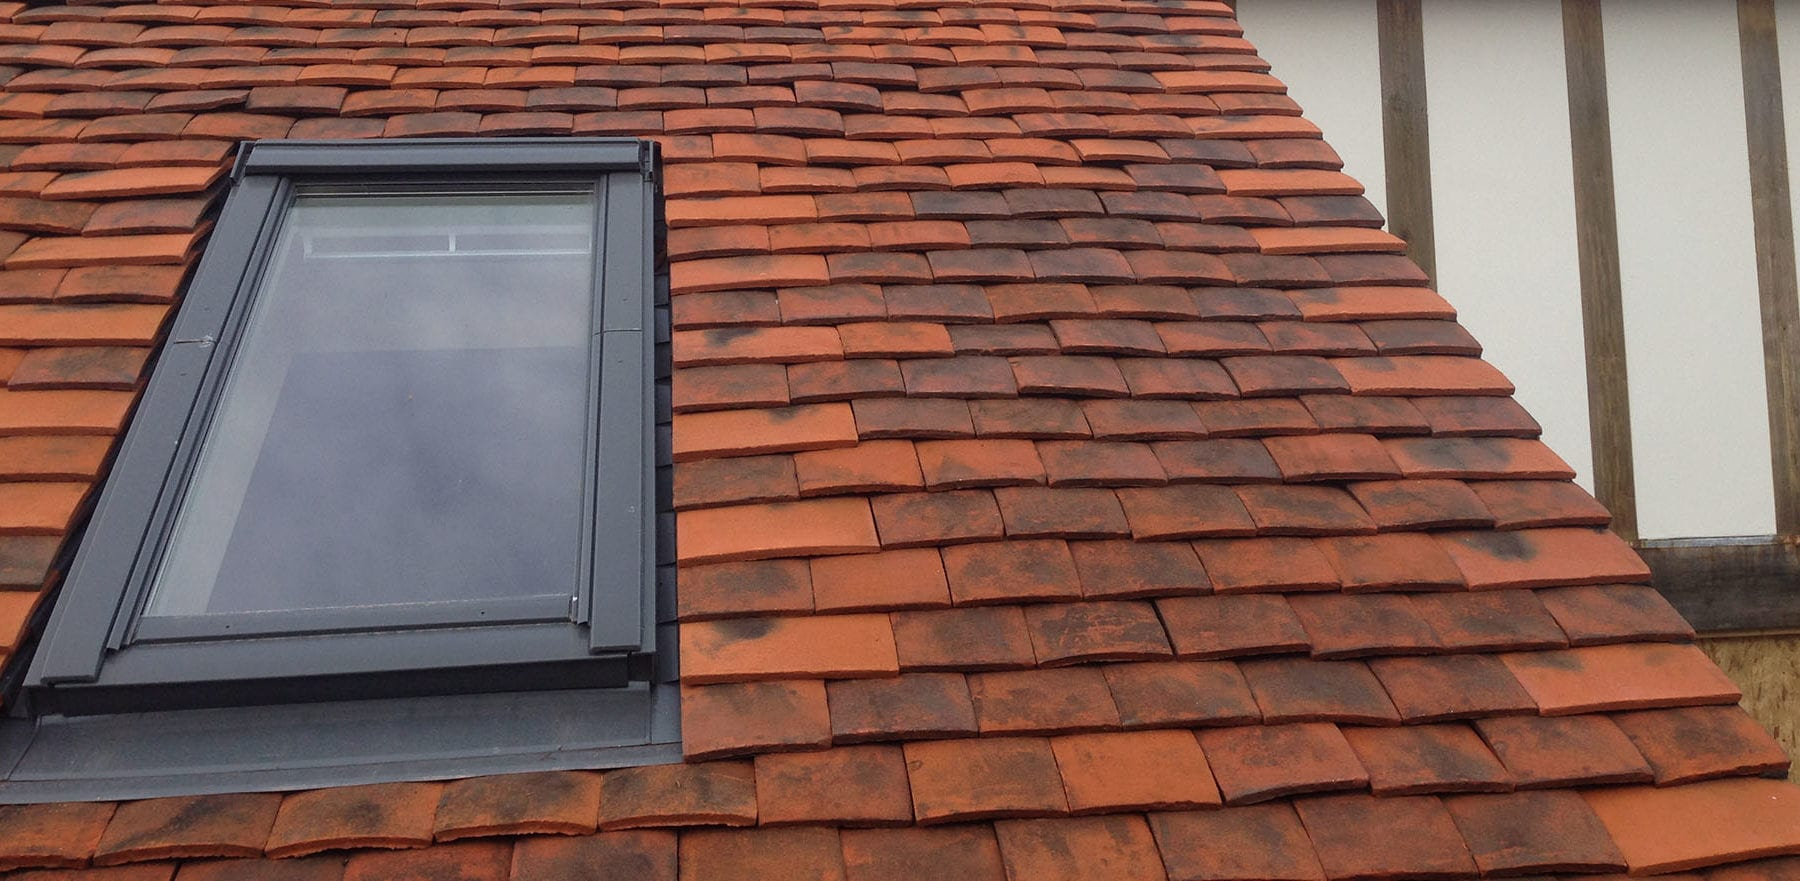 Lifestiles - Handmade Berkshire Clay Roof Tiles - Crowthorne, England 3